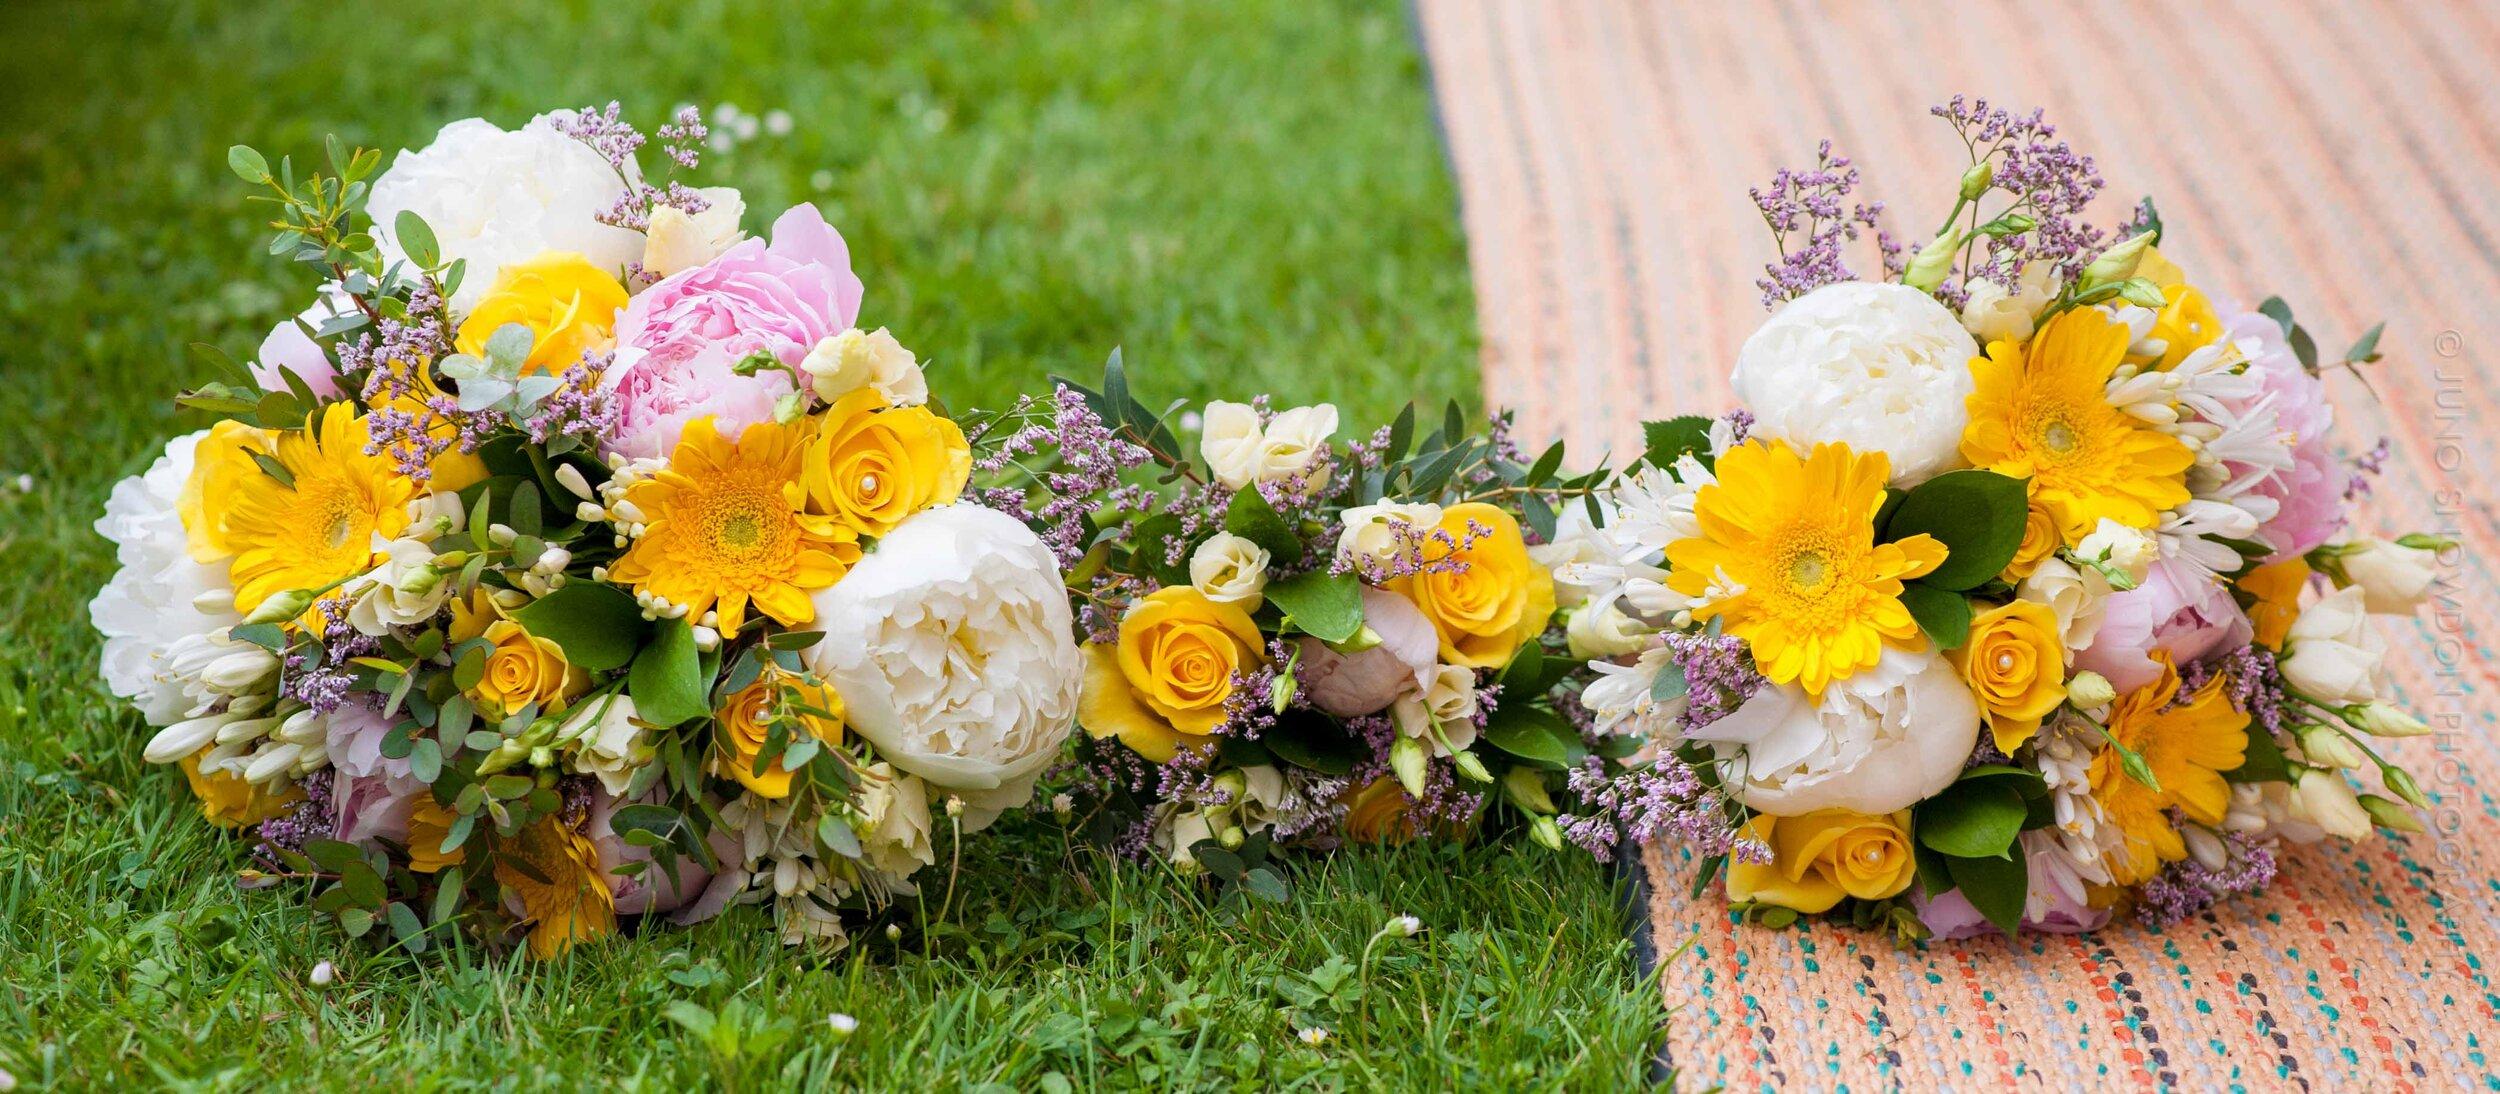 juno-snowdon-photography-wedding-0729.jpg